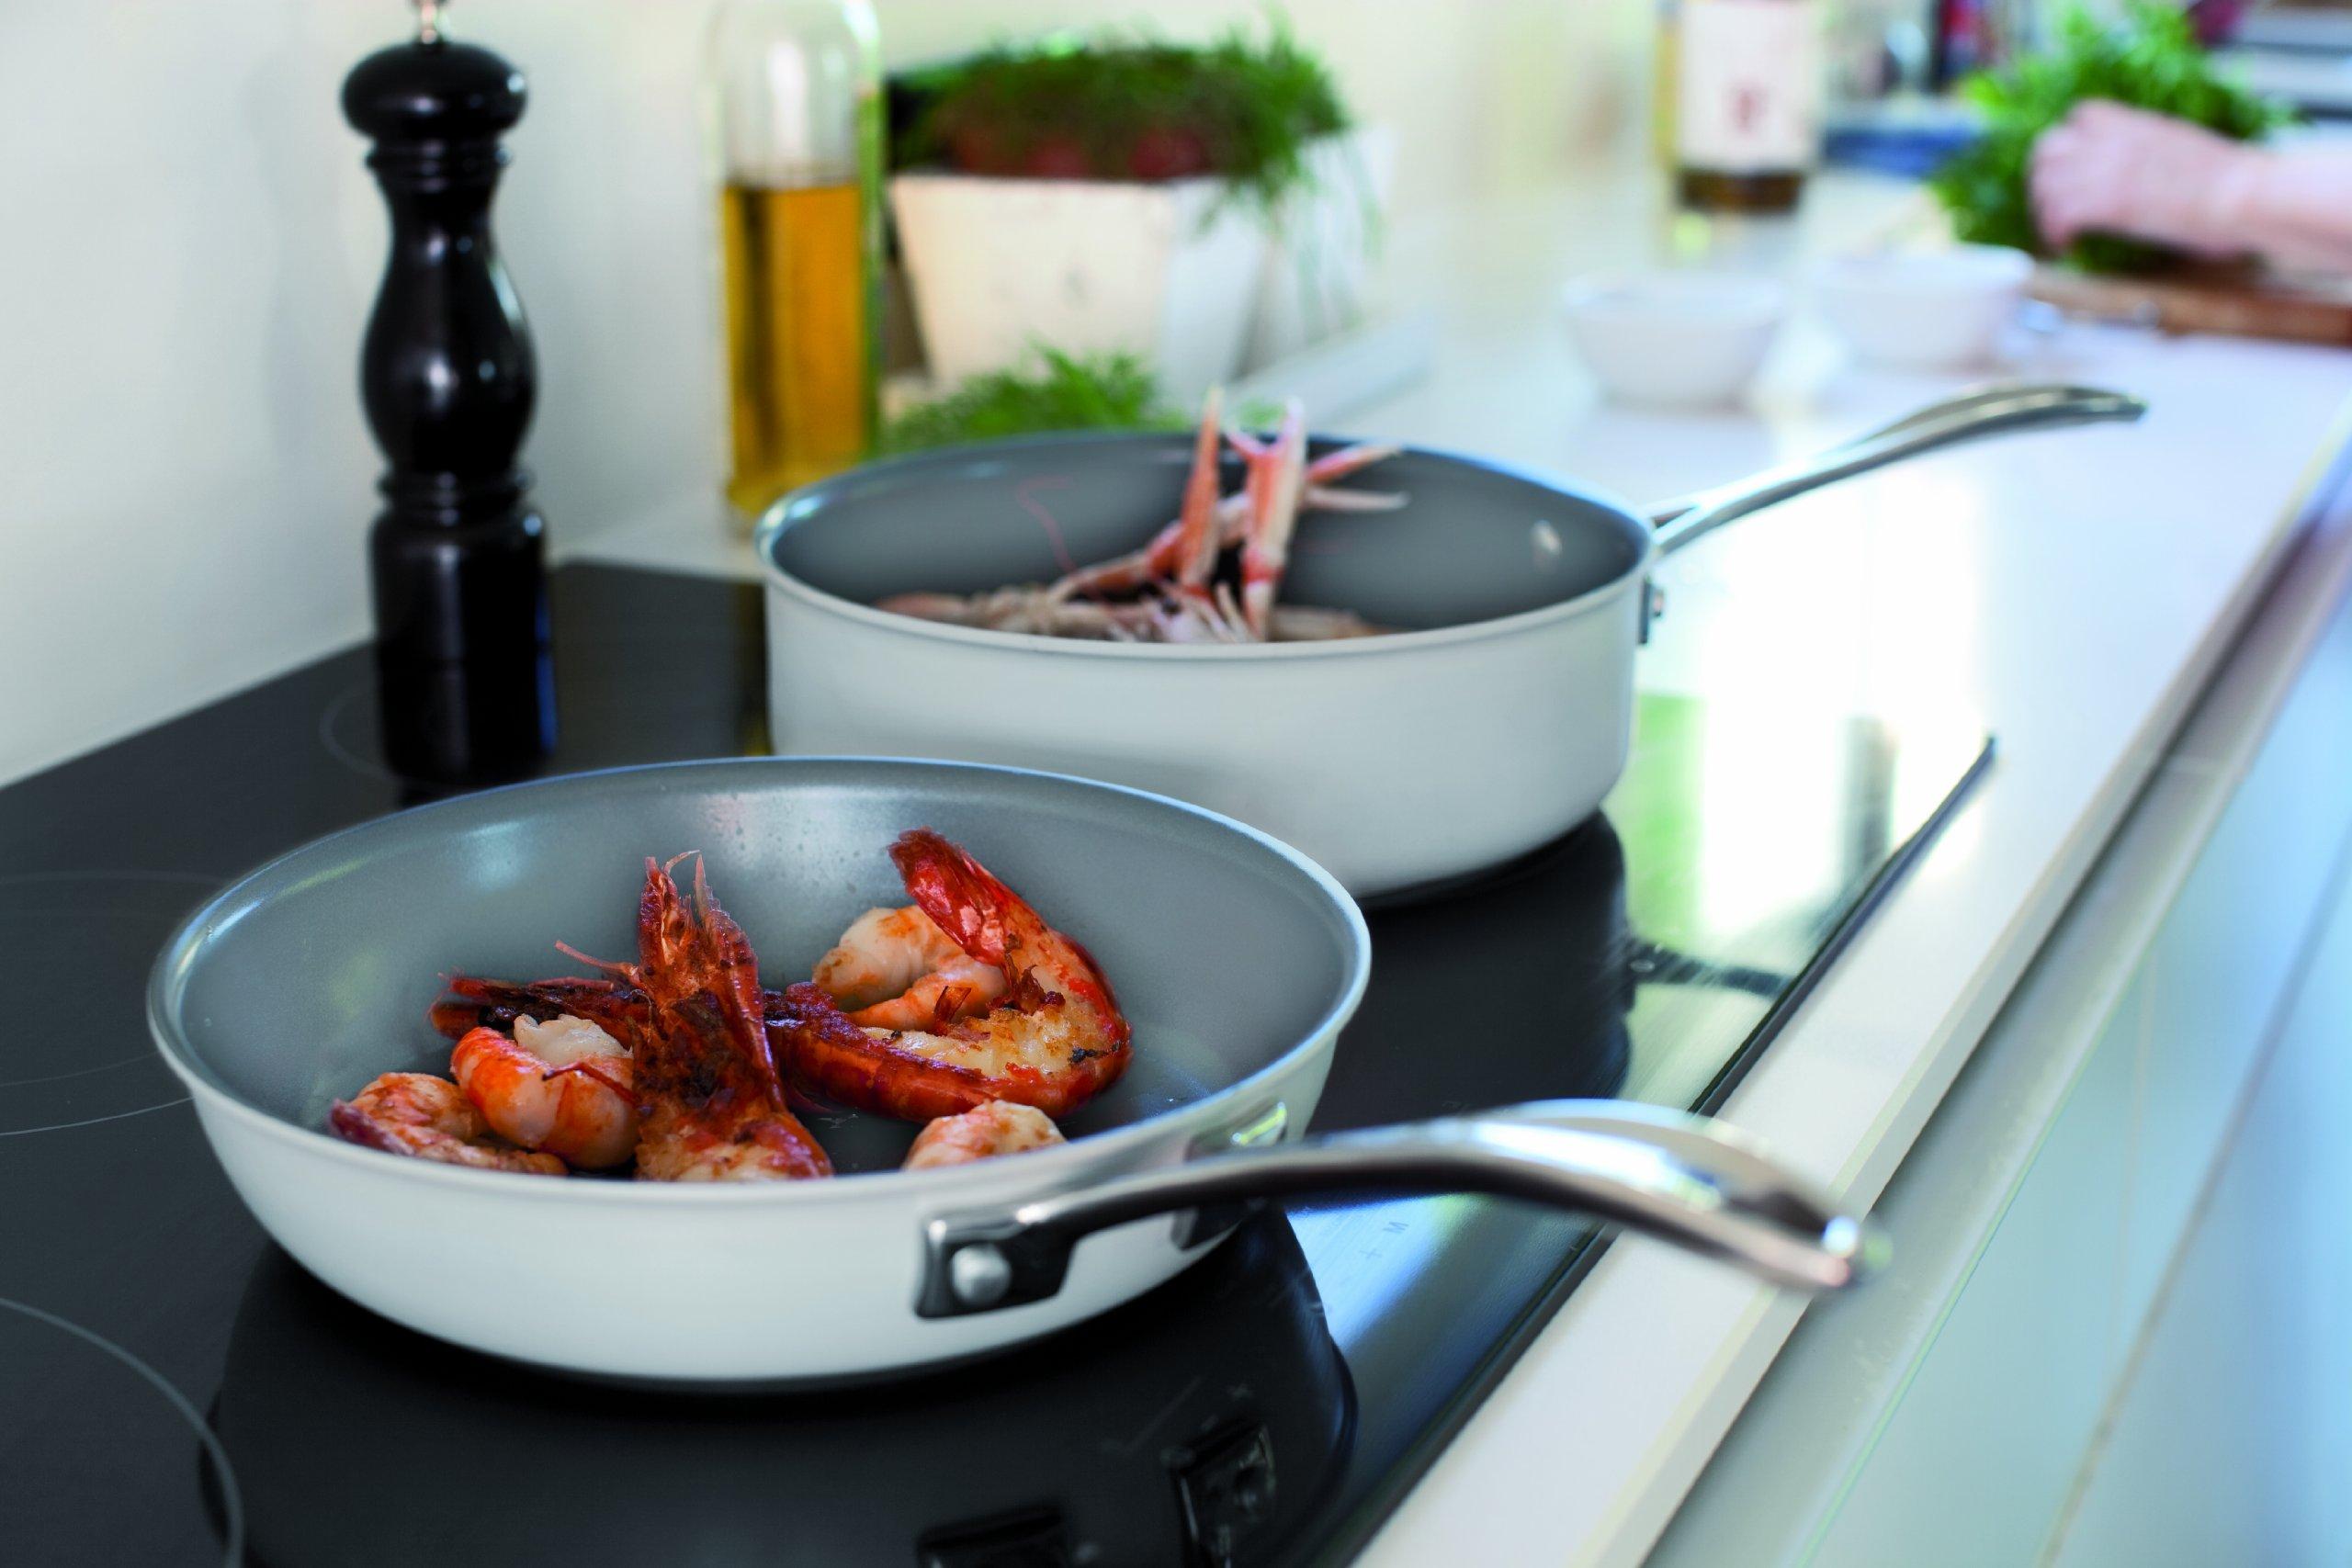 Beka Chef Eco-logic 100-Percent Eco-Hardened-Aluminum Bekadur-Ceramica-Nonstick 8-Inch Fry Pan